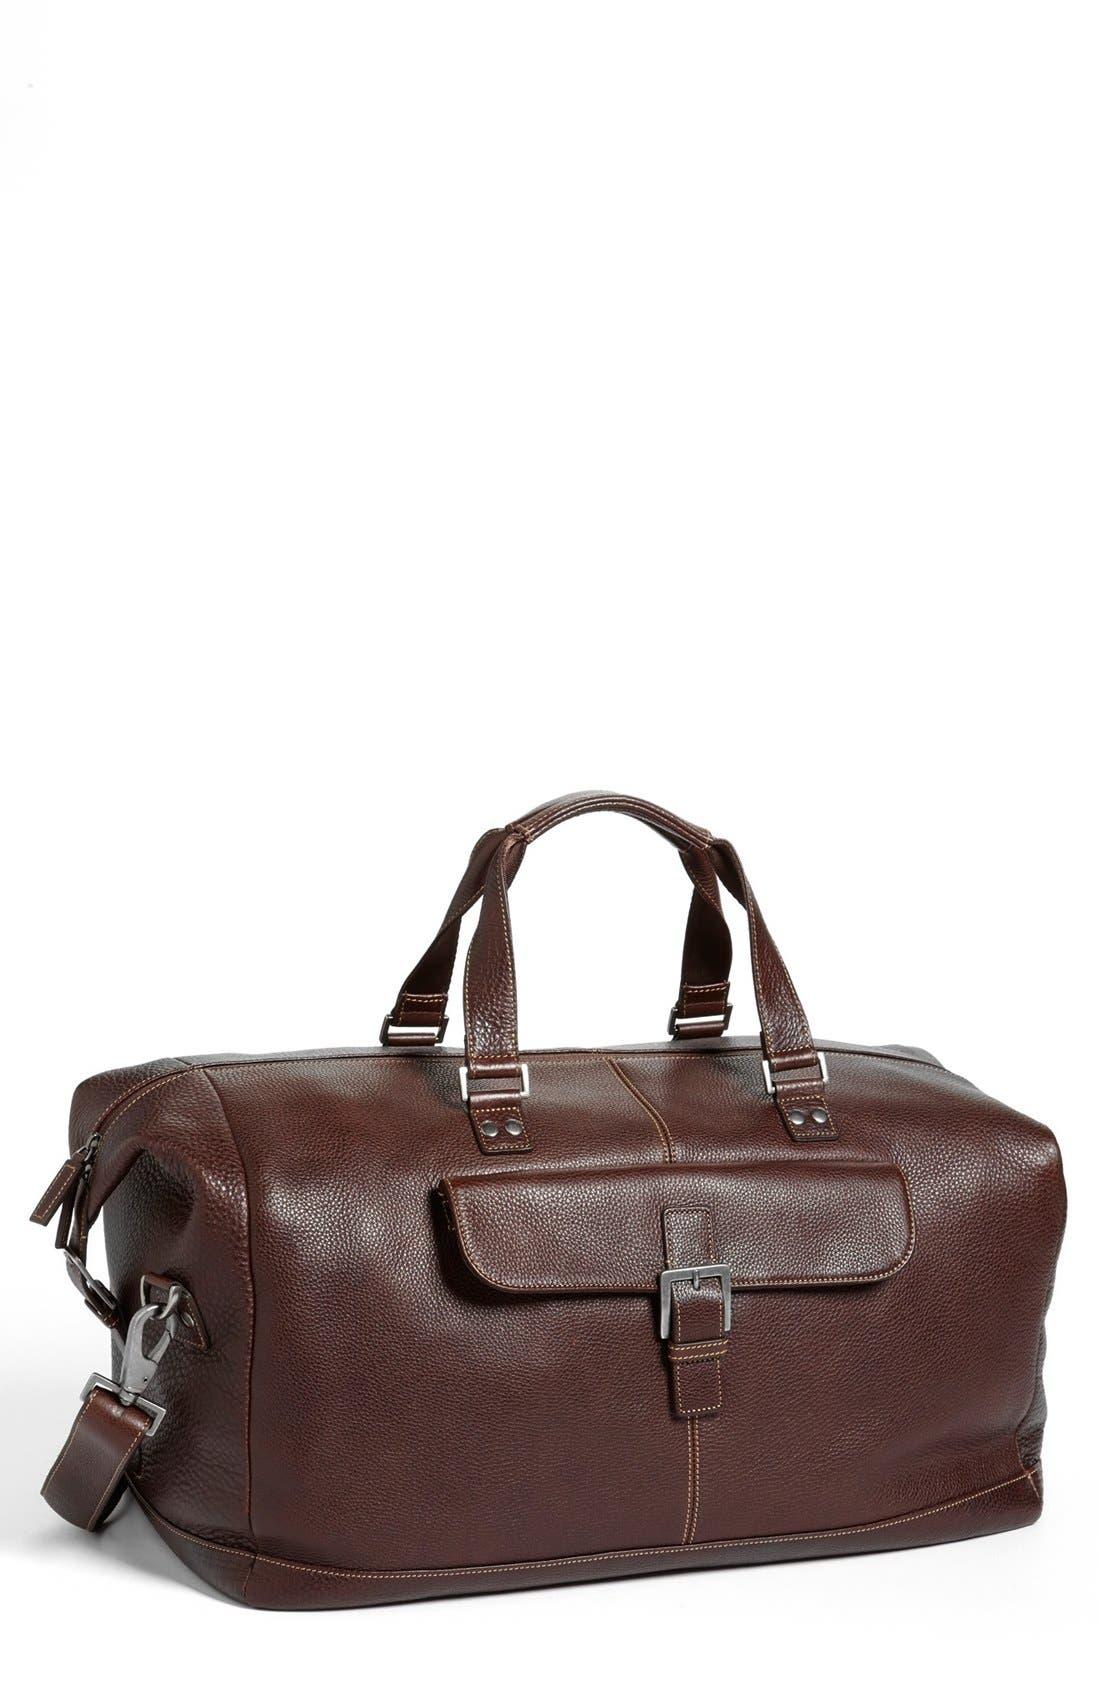 Tyler Leather Cargo Duffle Bag